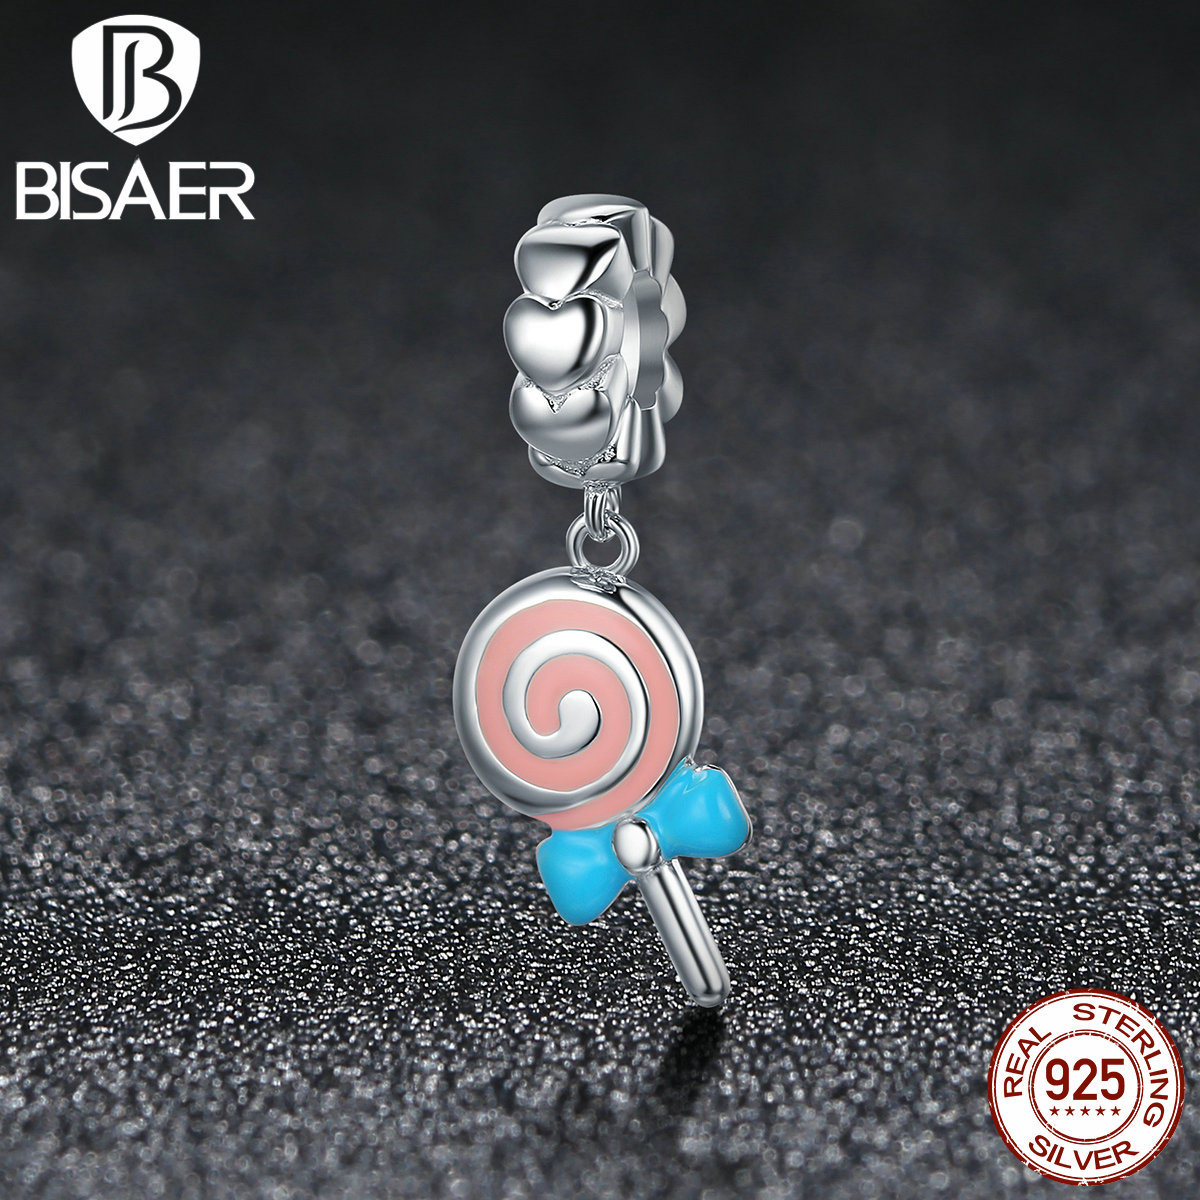 BISAER 100% 925 Sterling Silver Pink Love, Cute Lollipop Candles Charms Fit Pan Original Bracelets & Necklaces HSC349